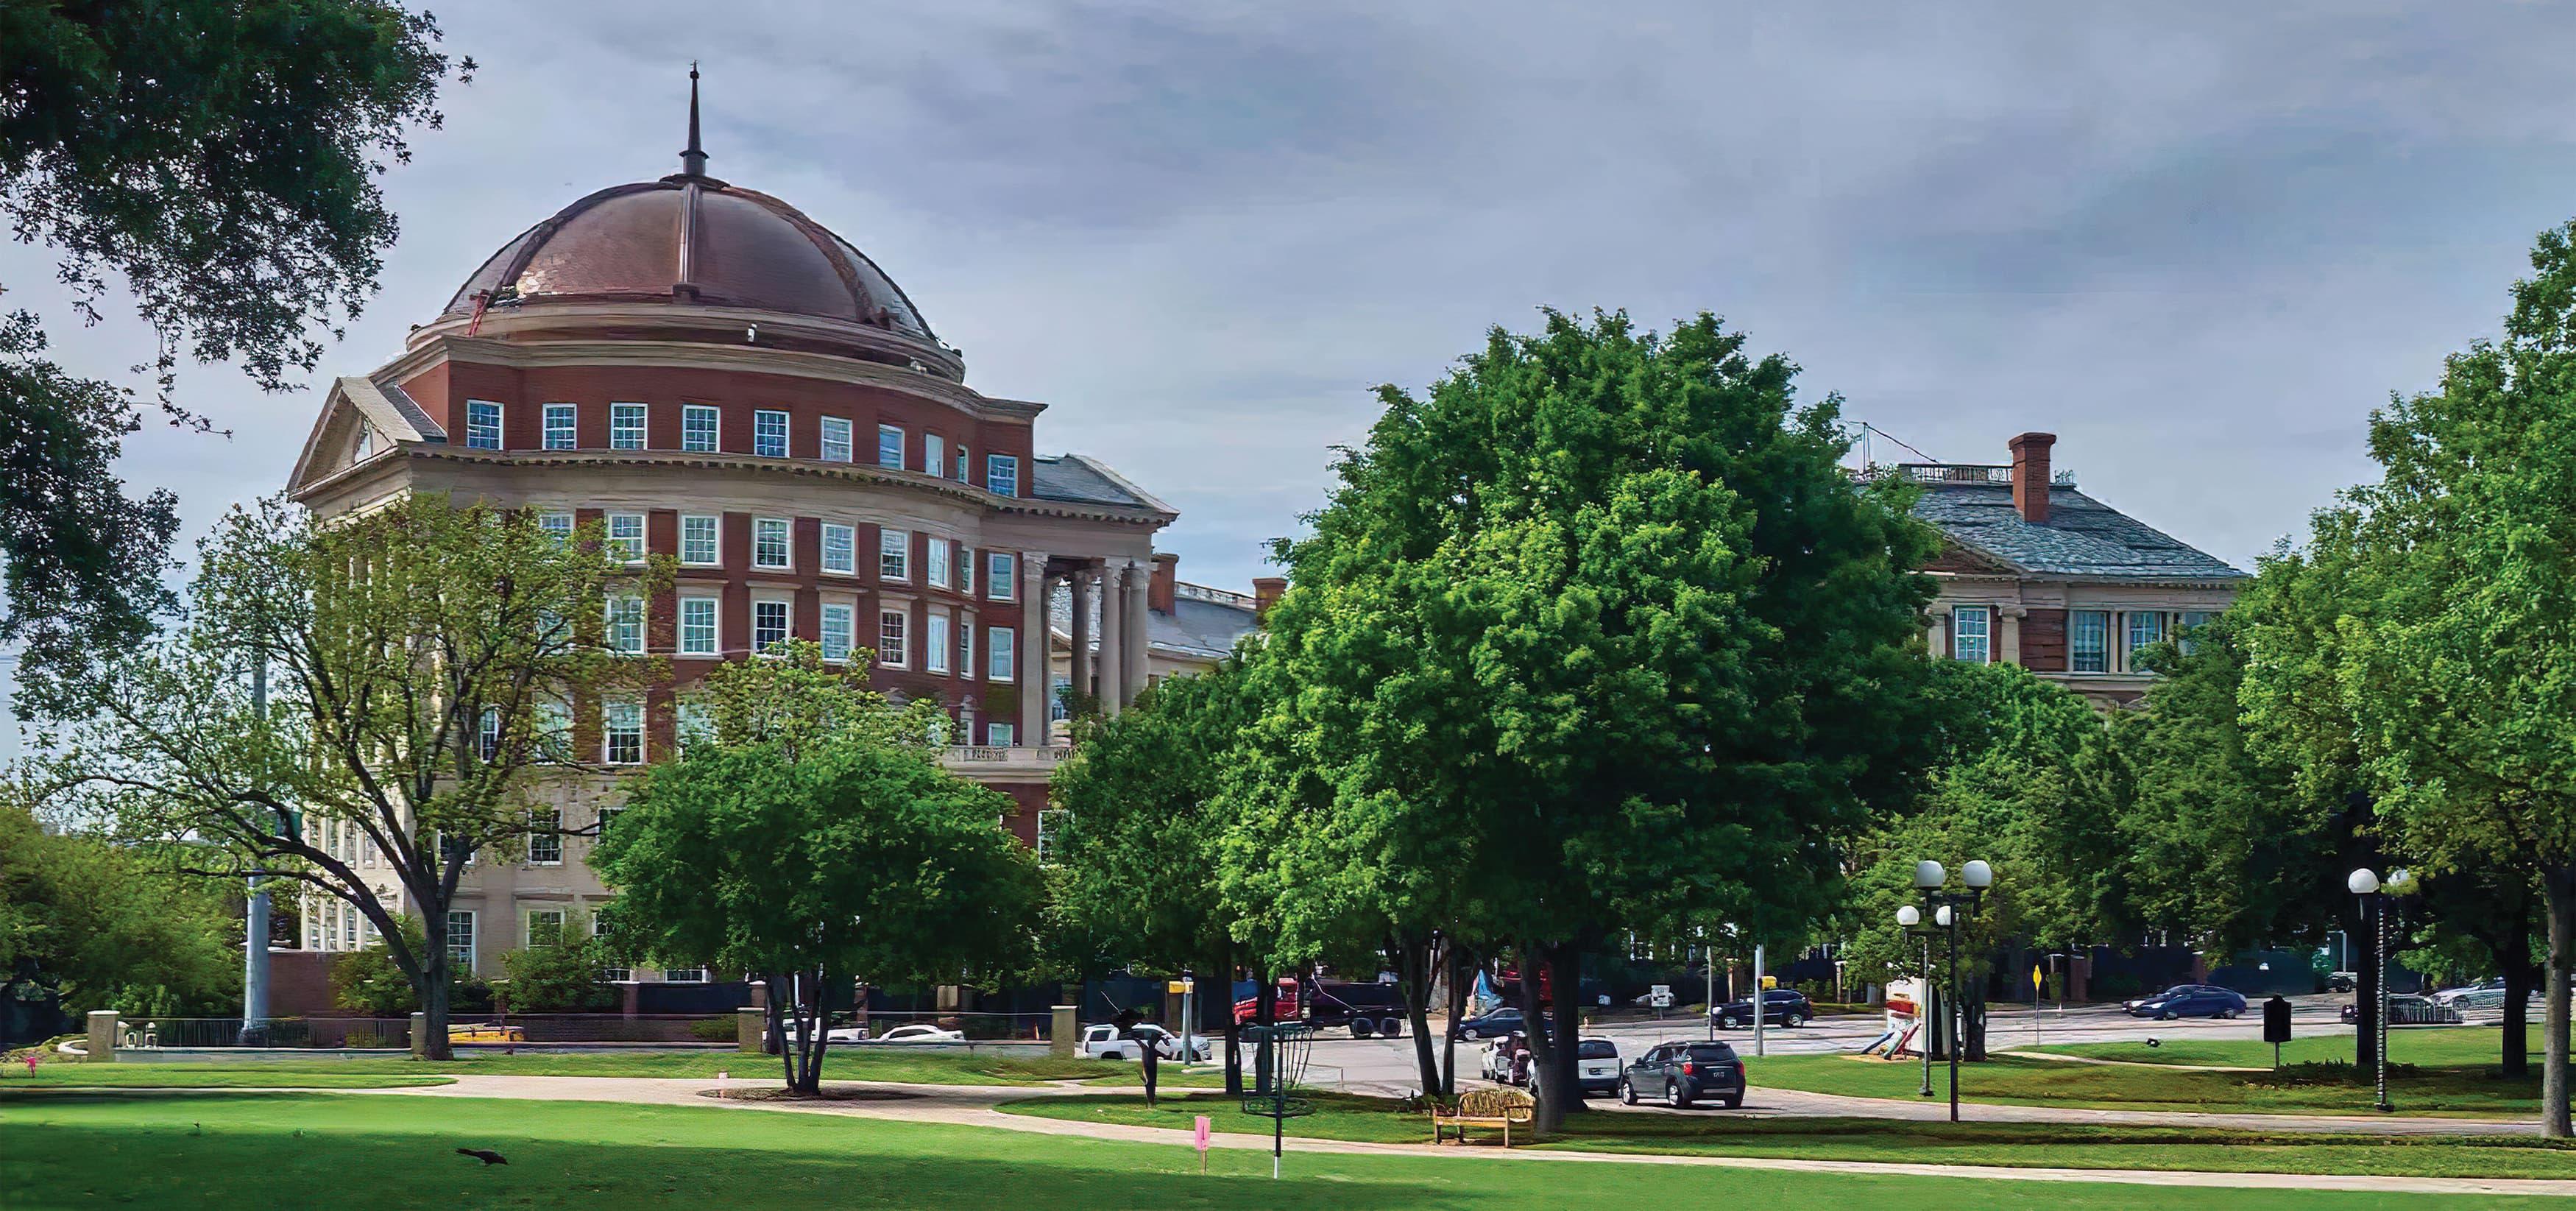 Old Parkland Campus in Dallas, Texas. Neo-Classical Architecture.